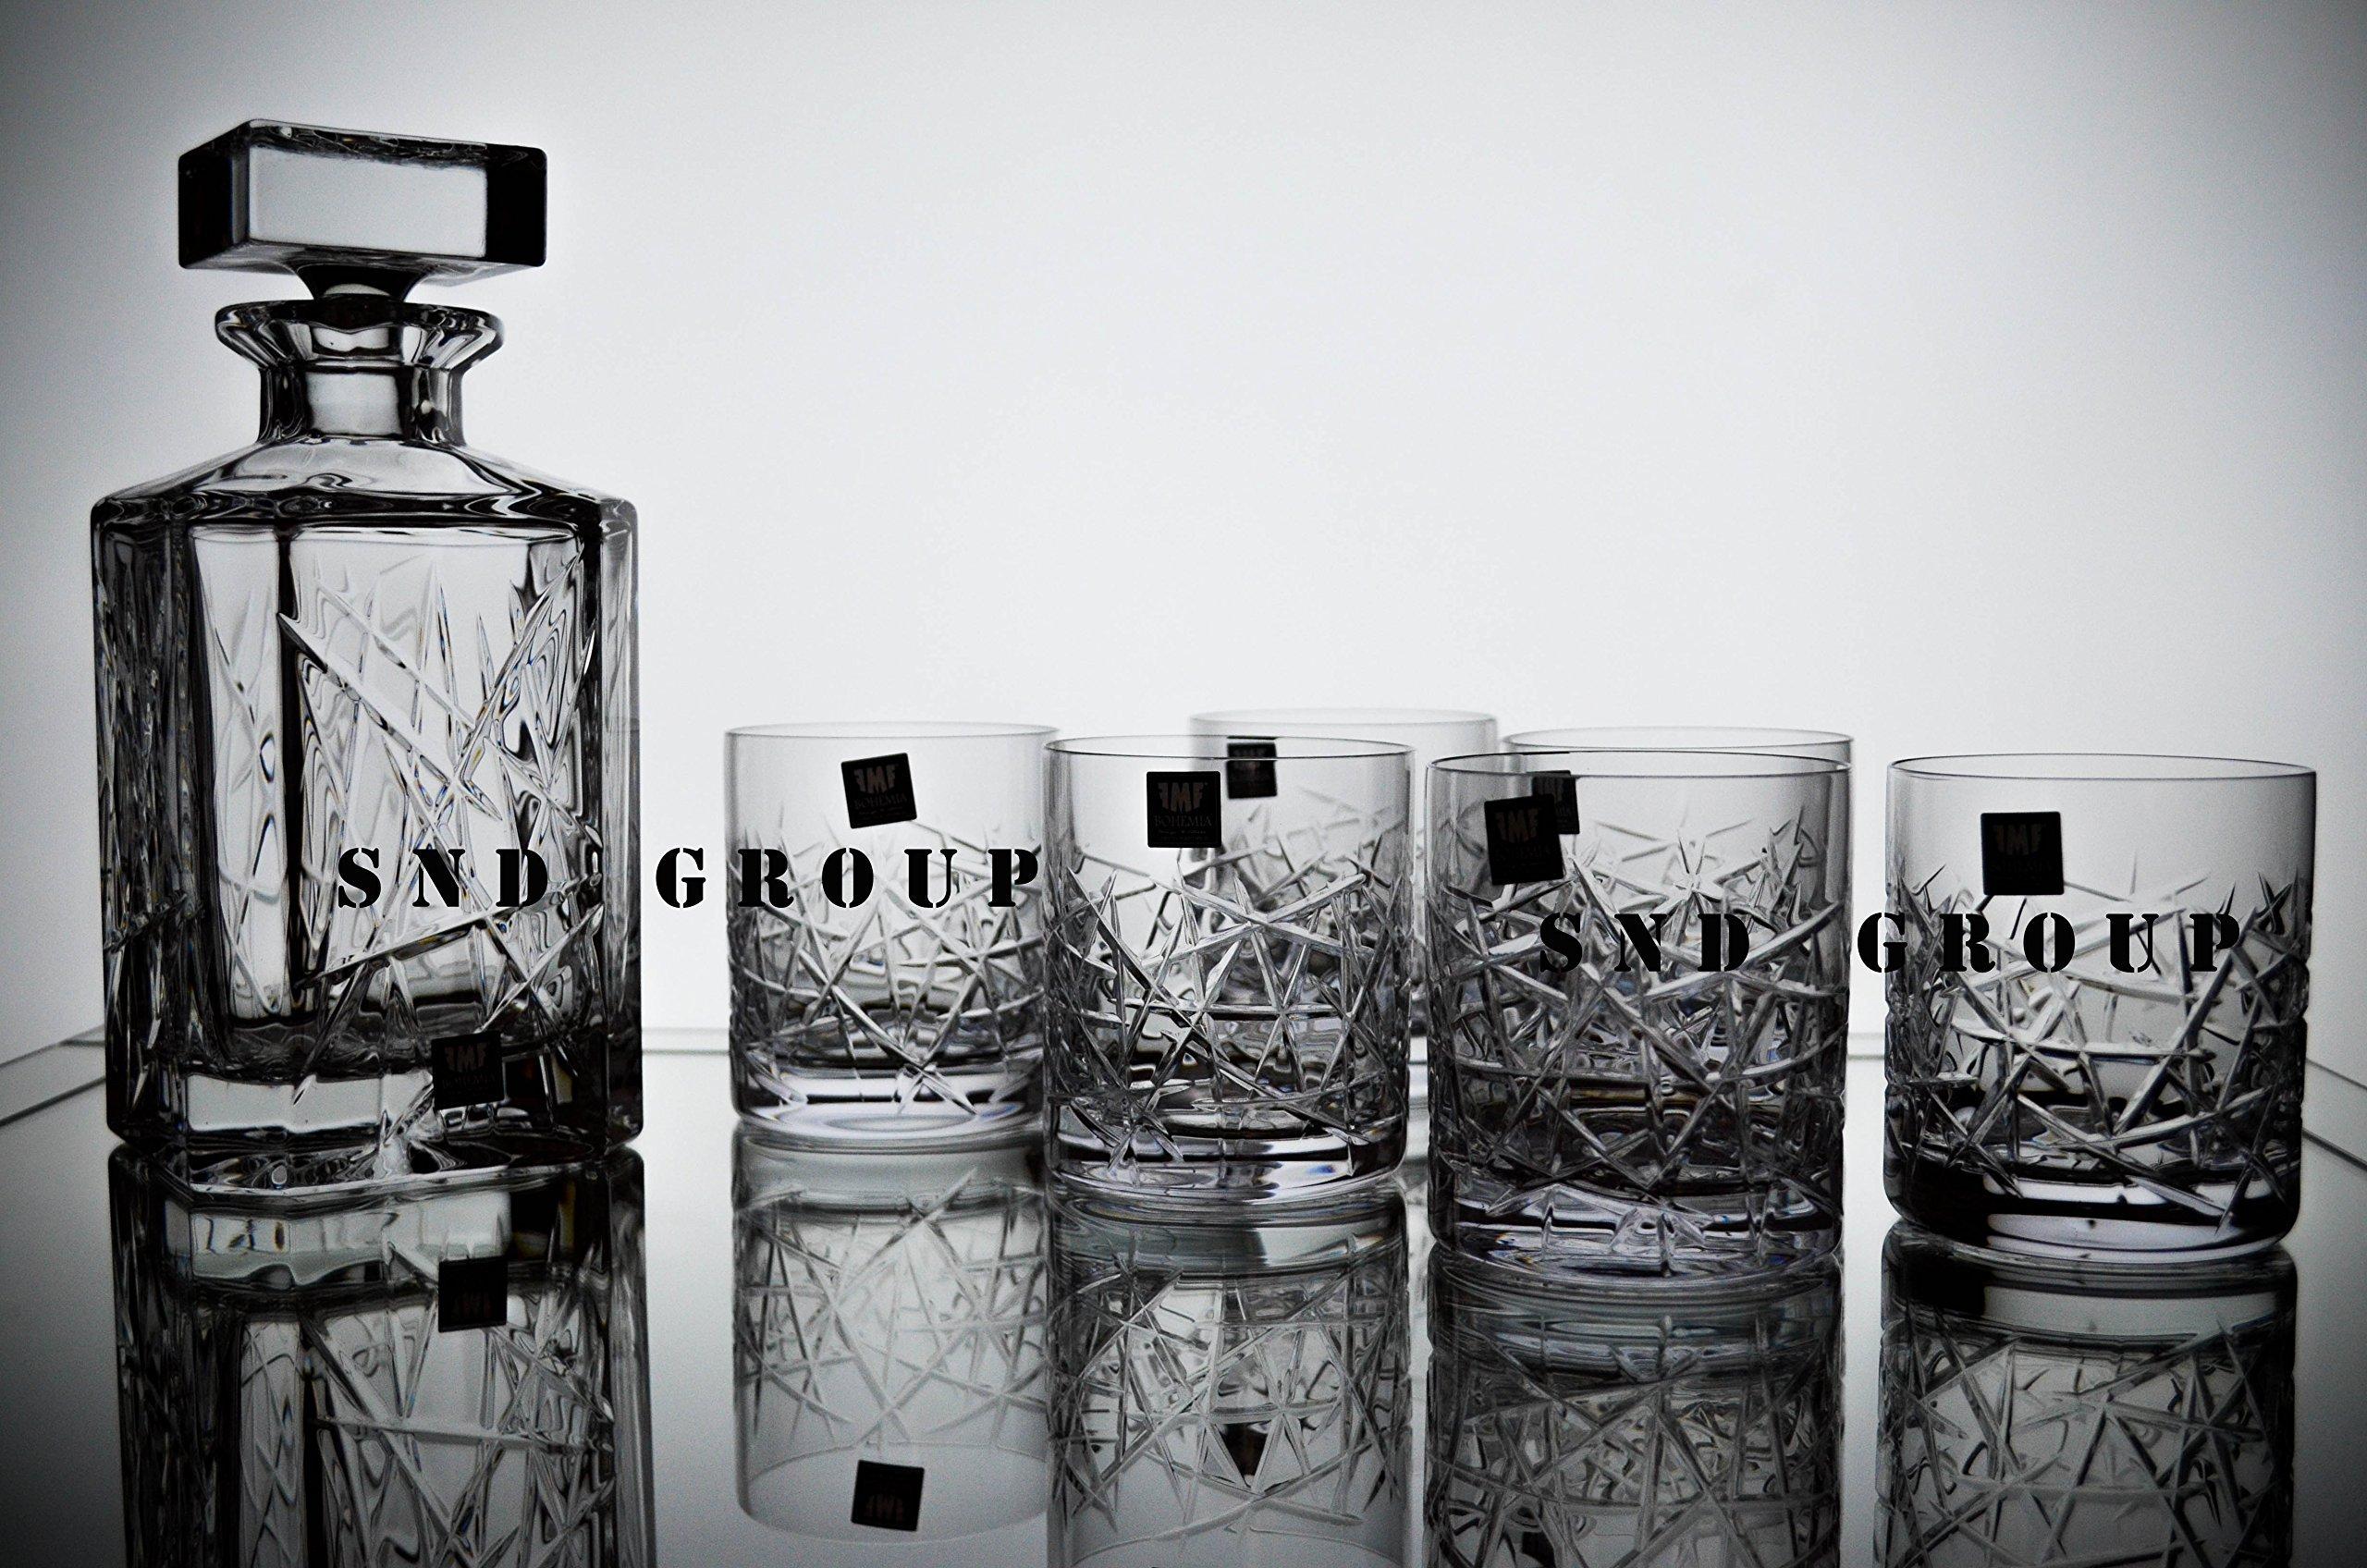 BOHEMIA CRYSTAL GLASS WHISKEY SET 1+6 ''Graffiti'' DECANTER 26oz + 6 OLD FASHIONED ROCKS GLASSES 10oz BOURBON SCOTCH COGNAC BRANDY CLASSIC VINTAGE DESIGN CZECH CRYSTAL GLASS